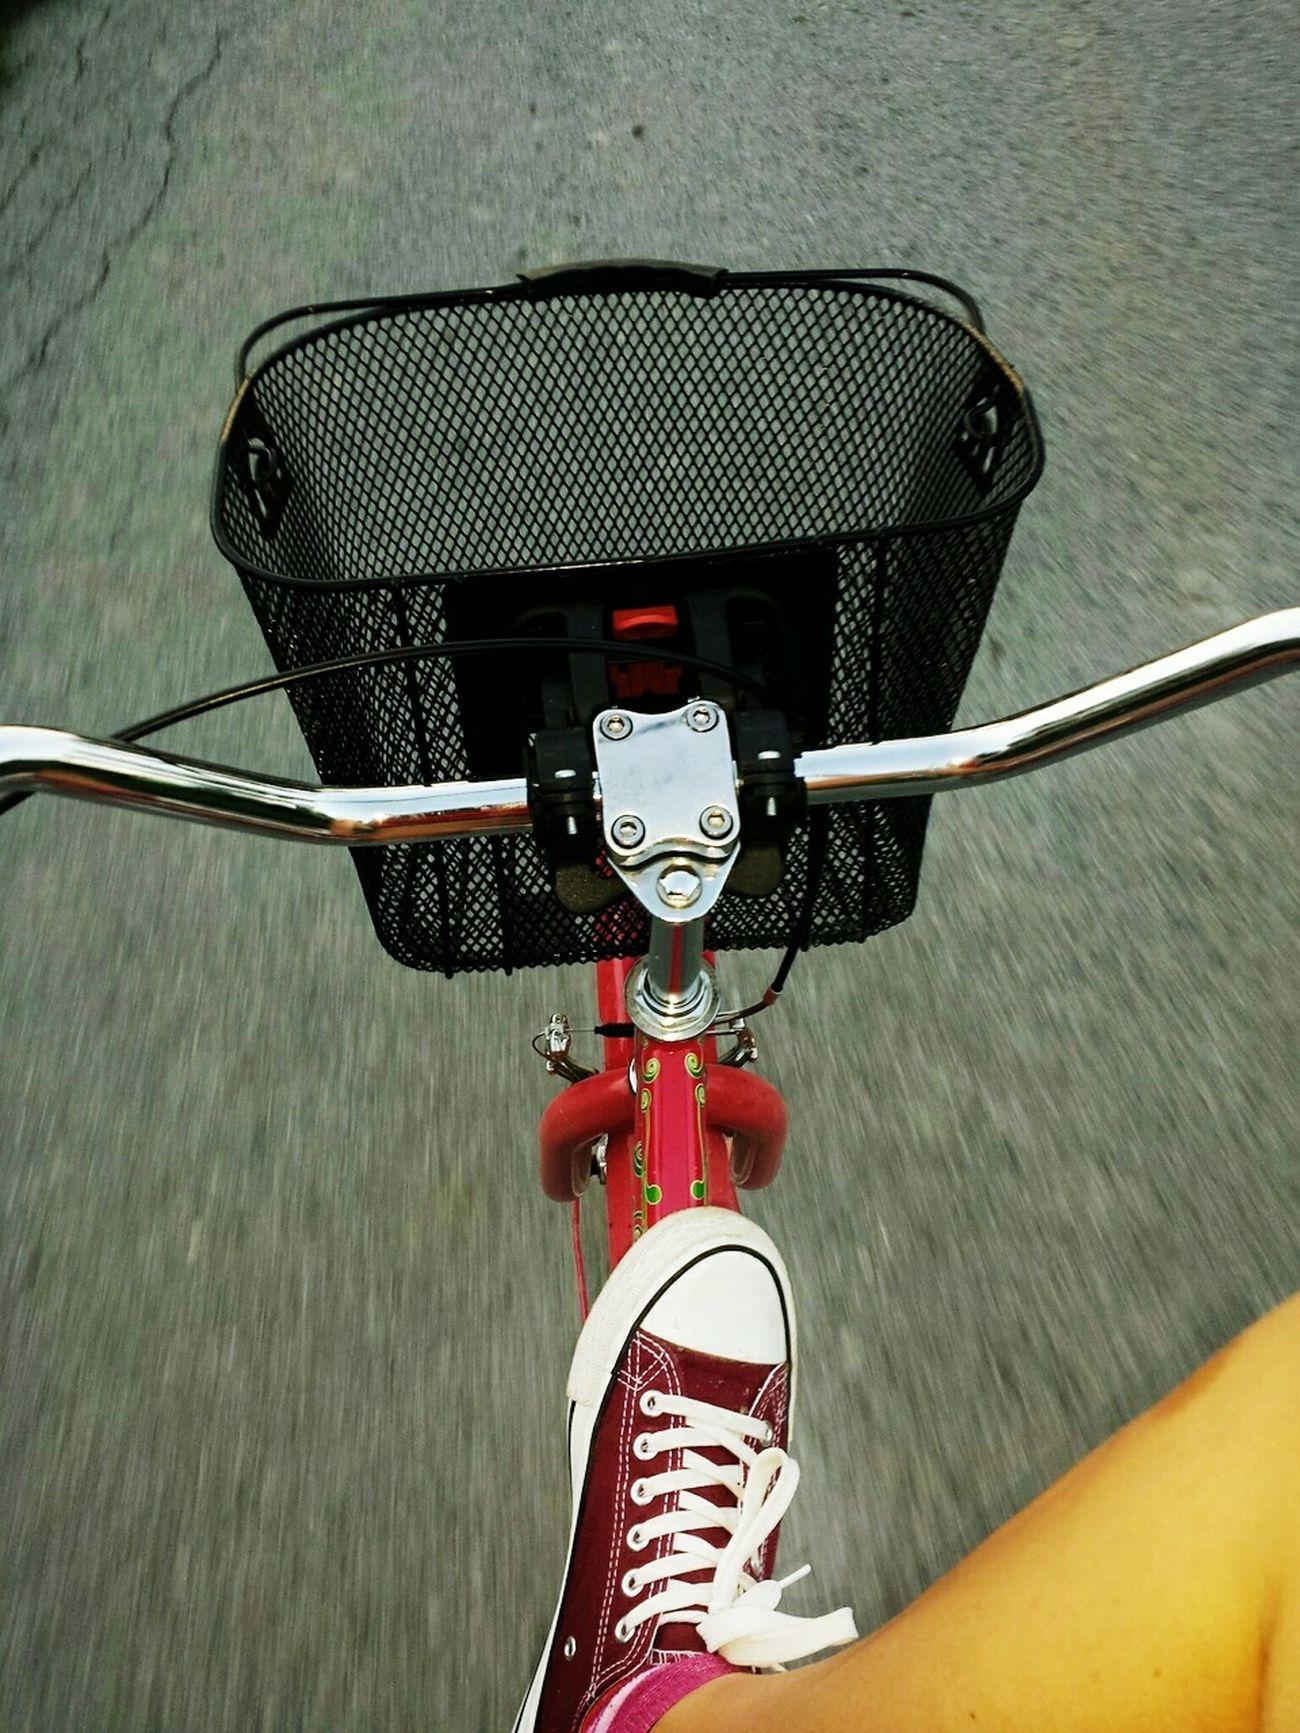 Bike Bike Life Biketour Bikelove Biketrip Bikersofinstagram Outdoors